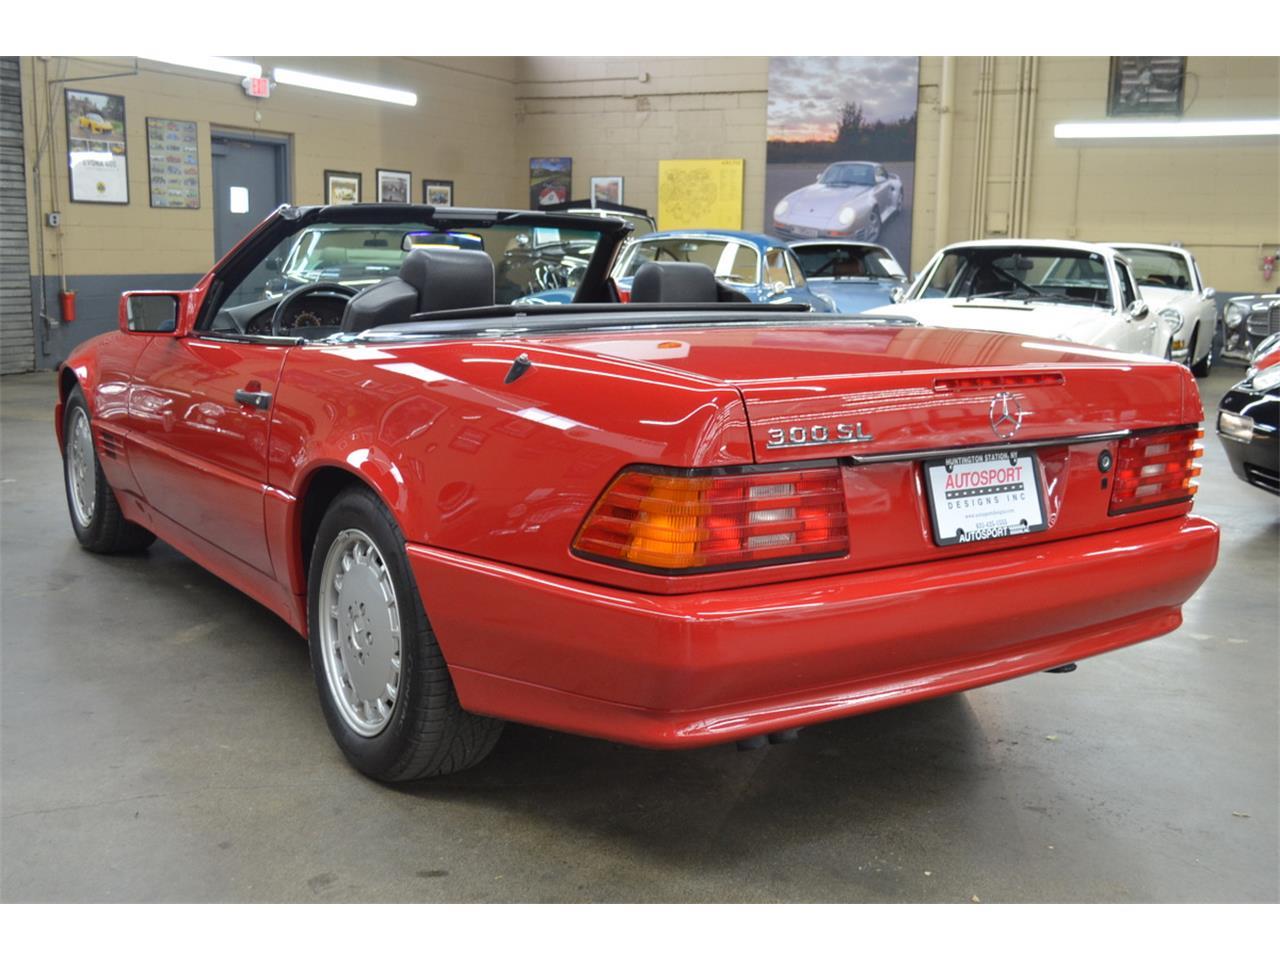 1991 Mercedes-Benz 300SL for Sale | ClassicCars.com | CC-1350375